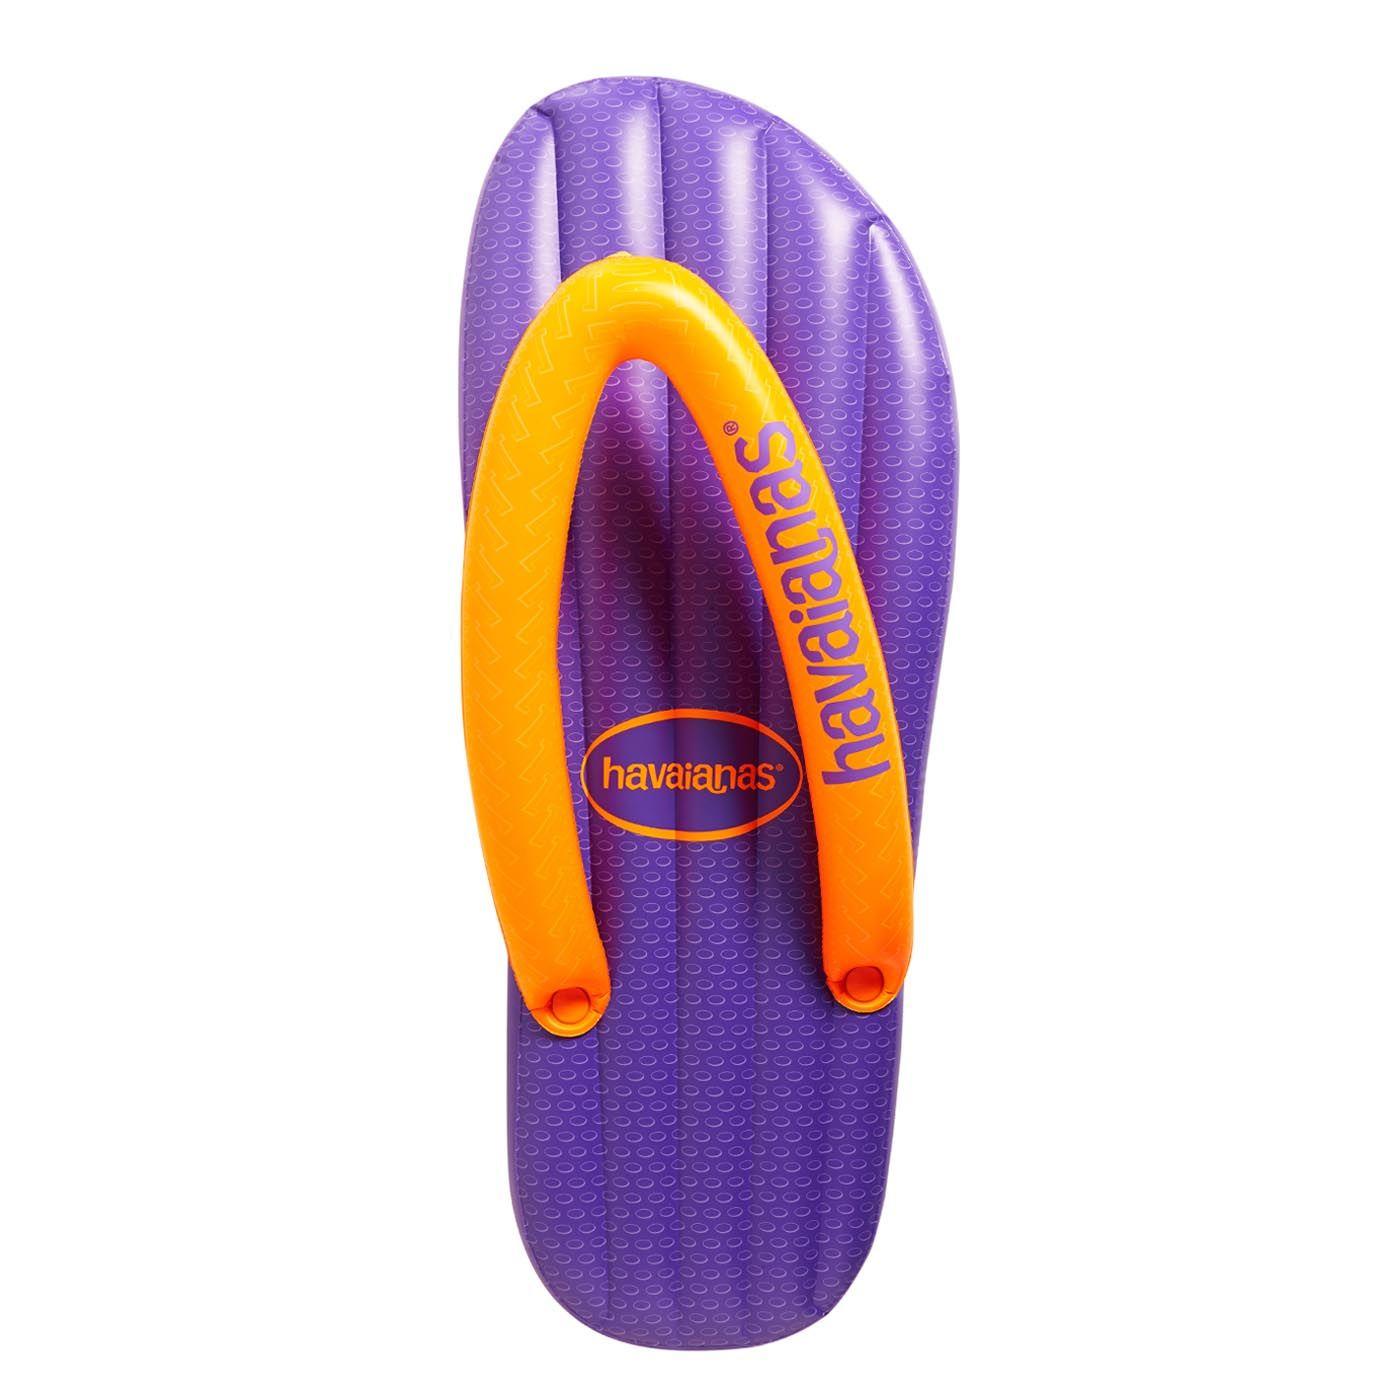 Top Mix Violet Inflatable Havaianas Orange And Purple Violet